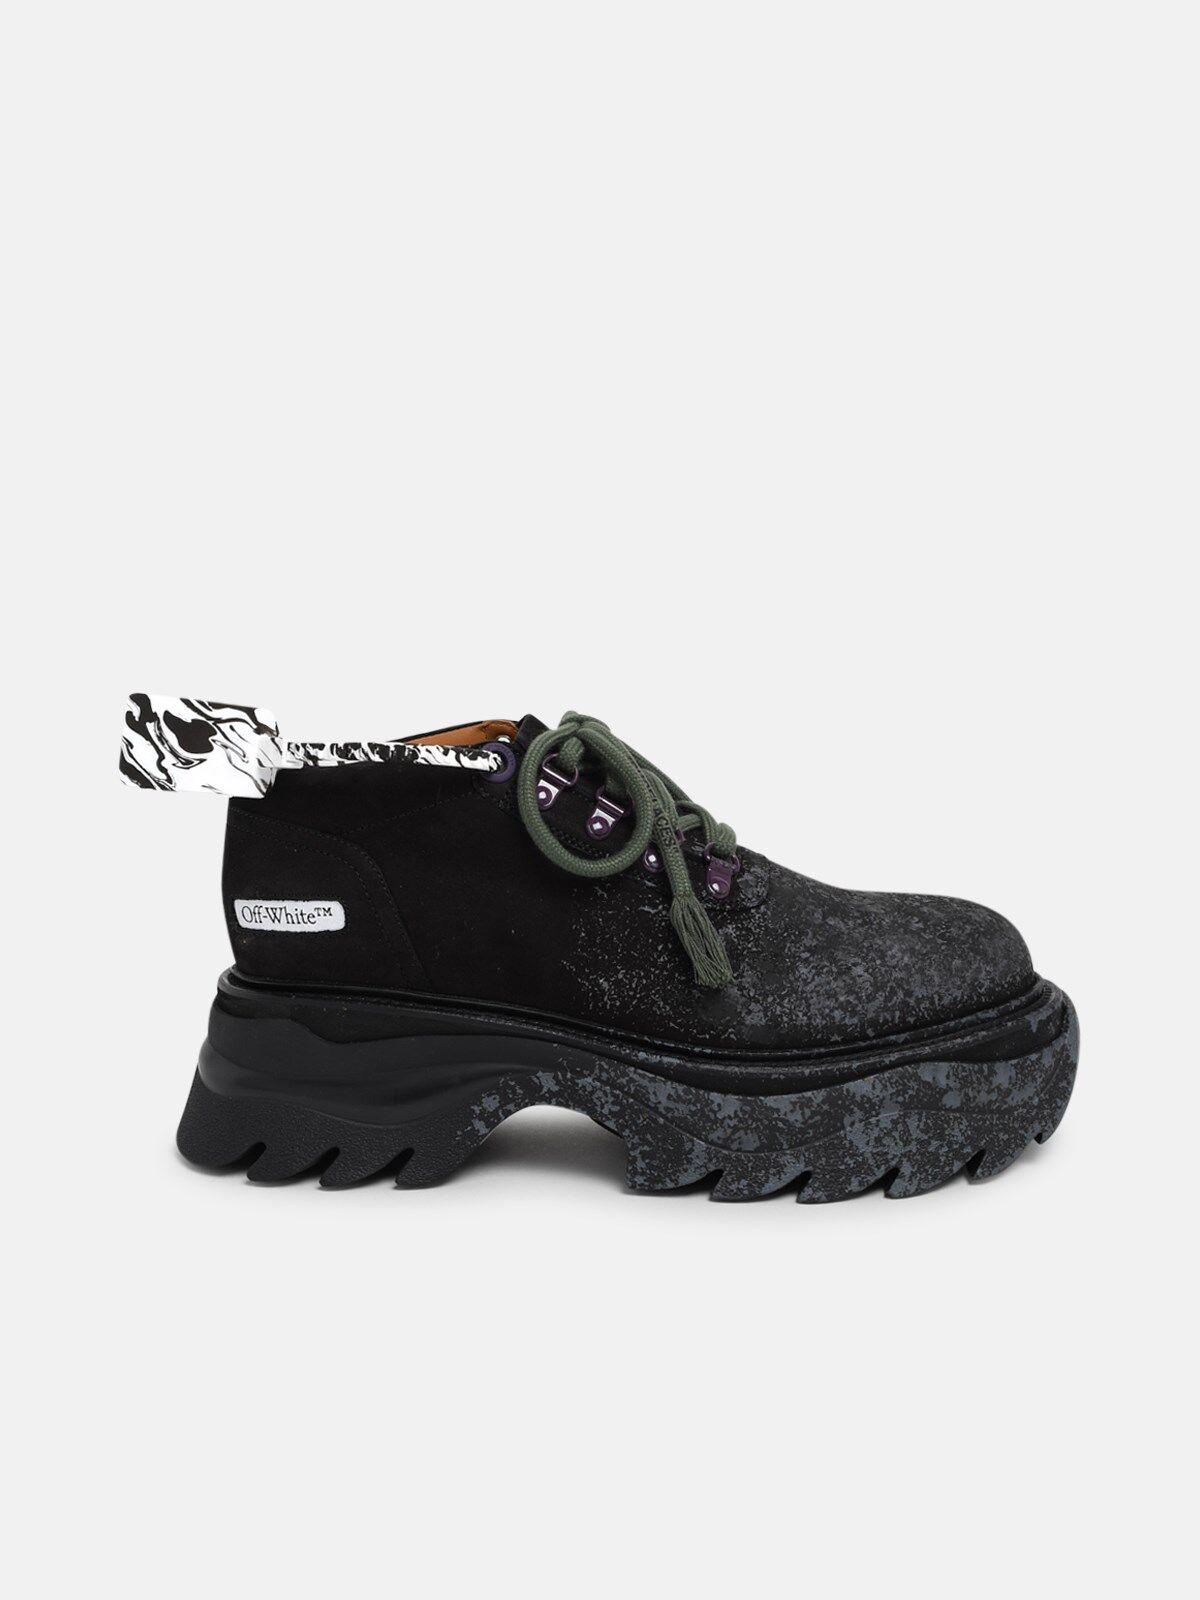 OFF WHITE Black Chunky Shoes (size: EU 42)